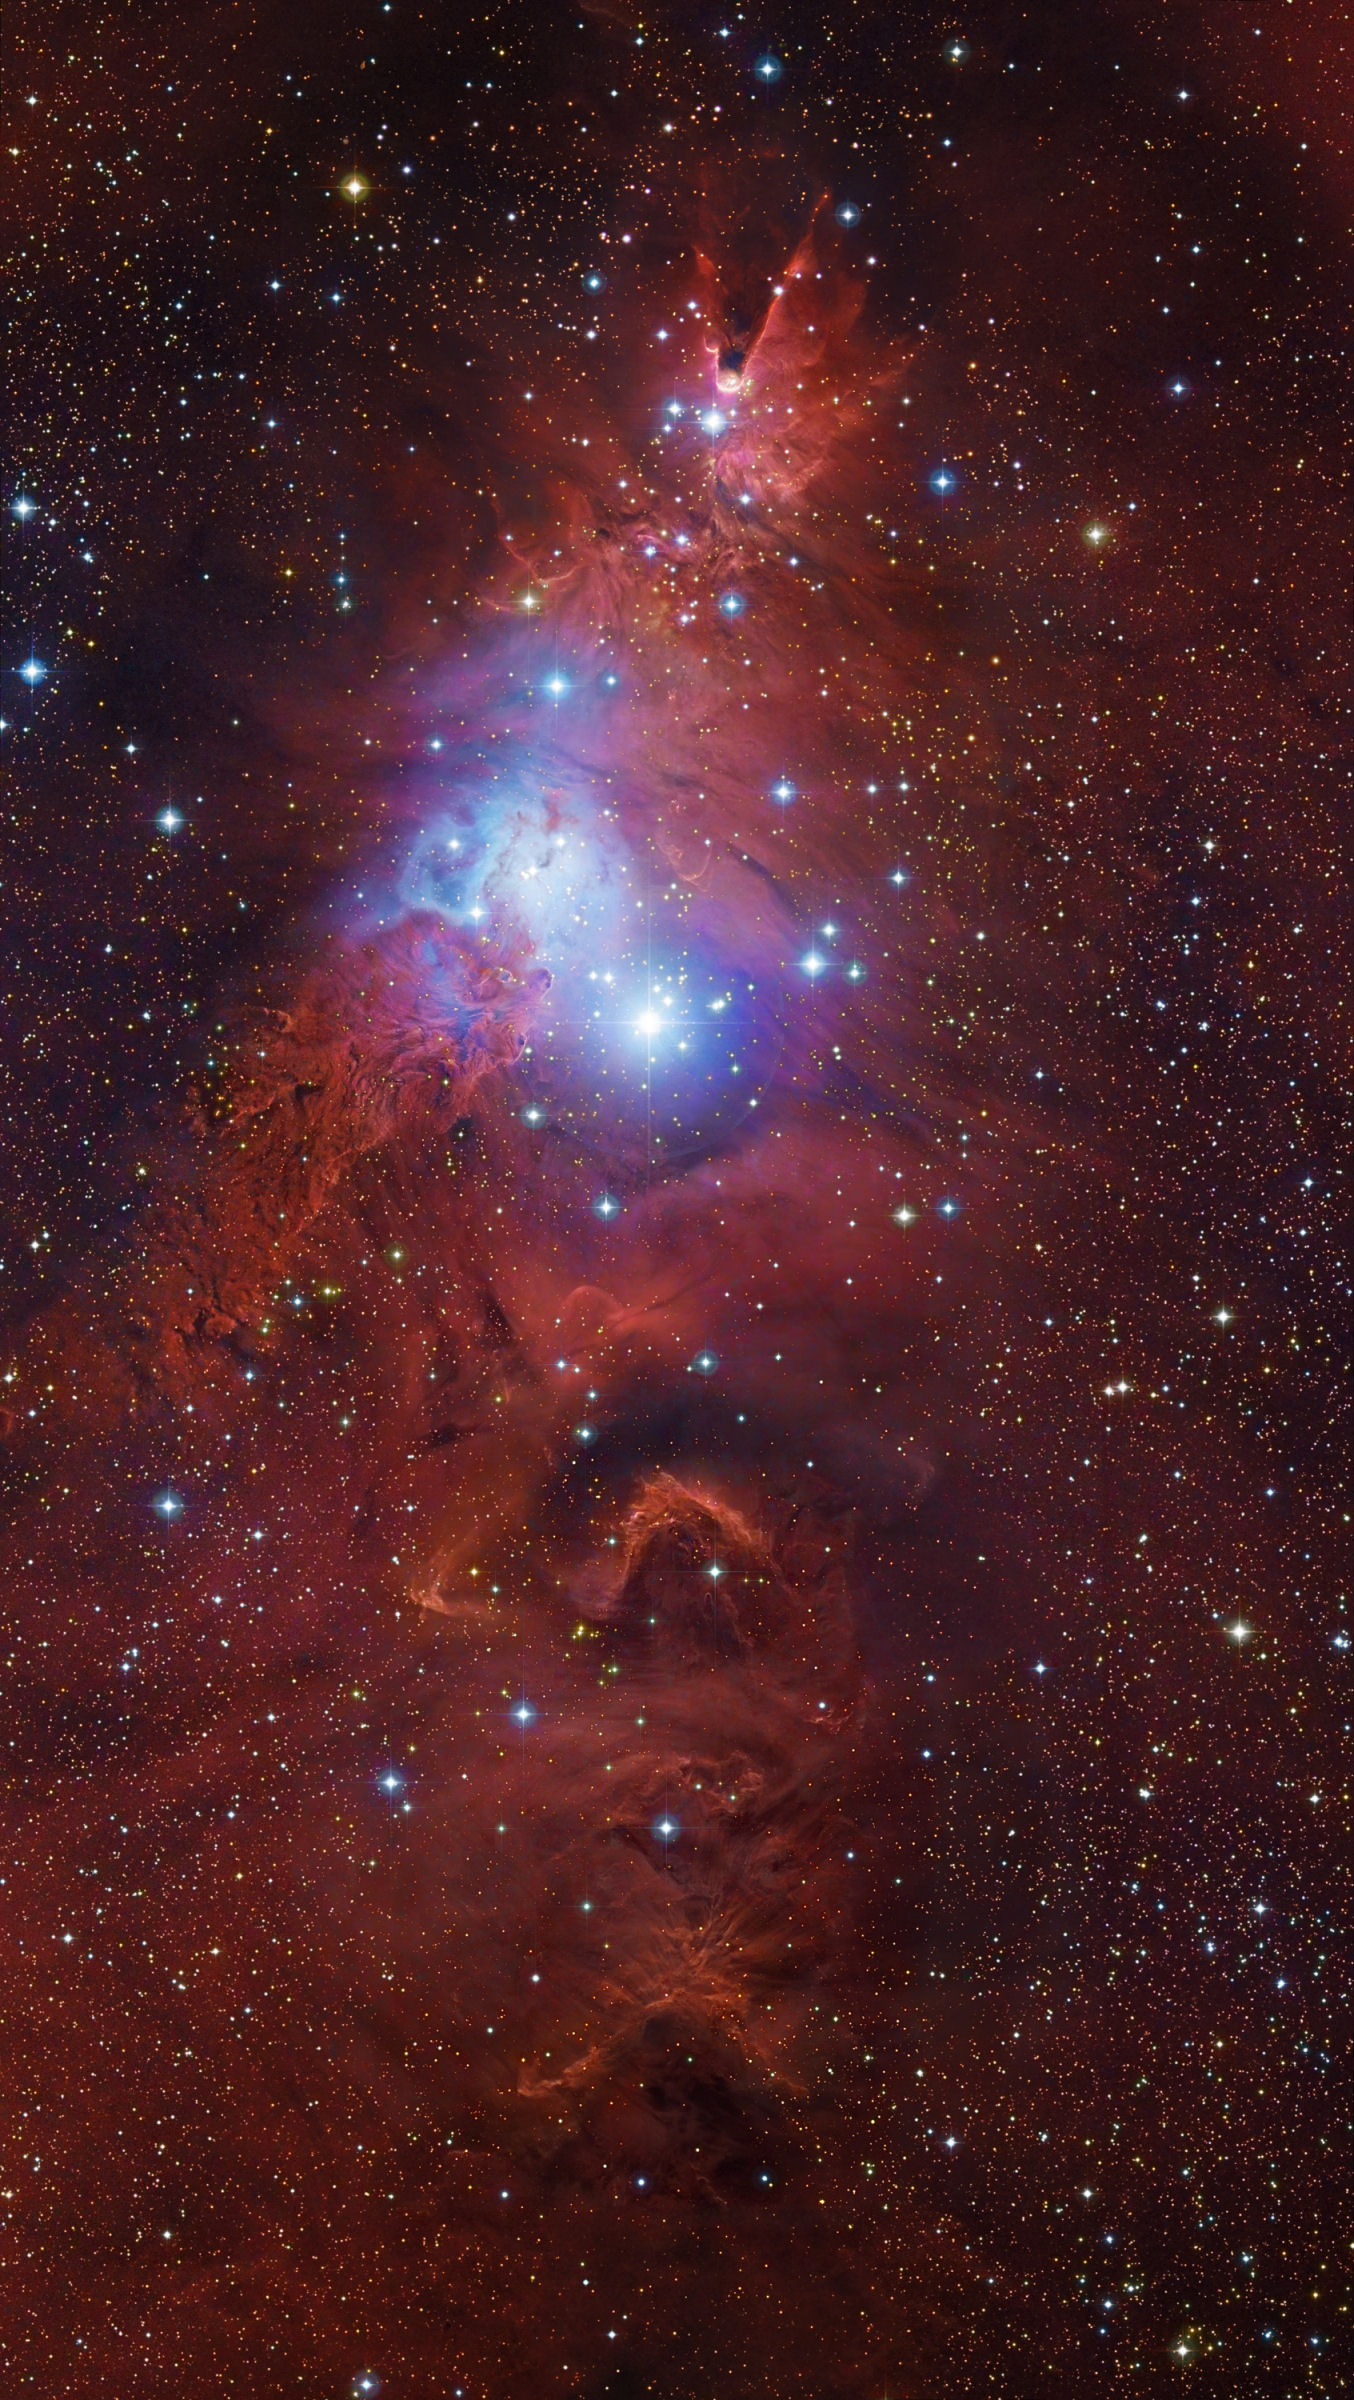 Star_NGC2264d1.jpg